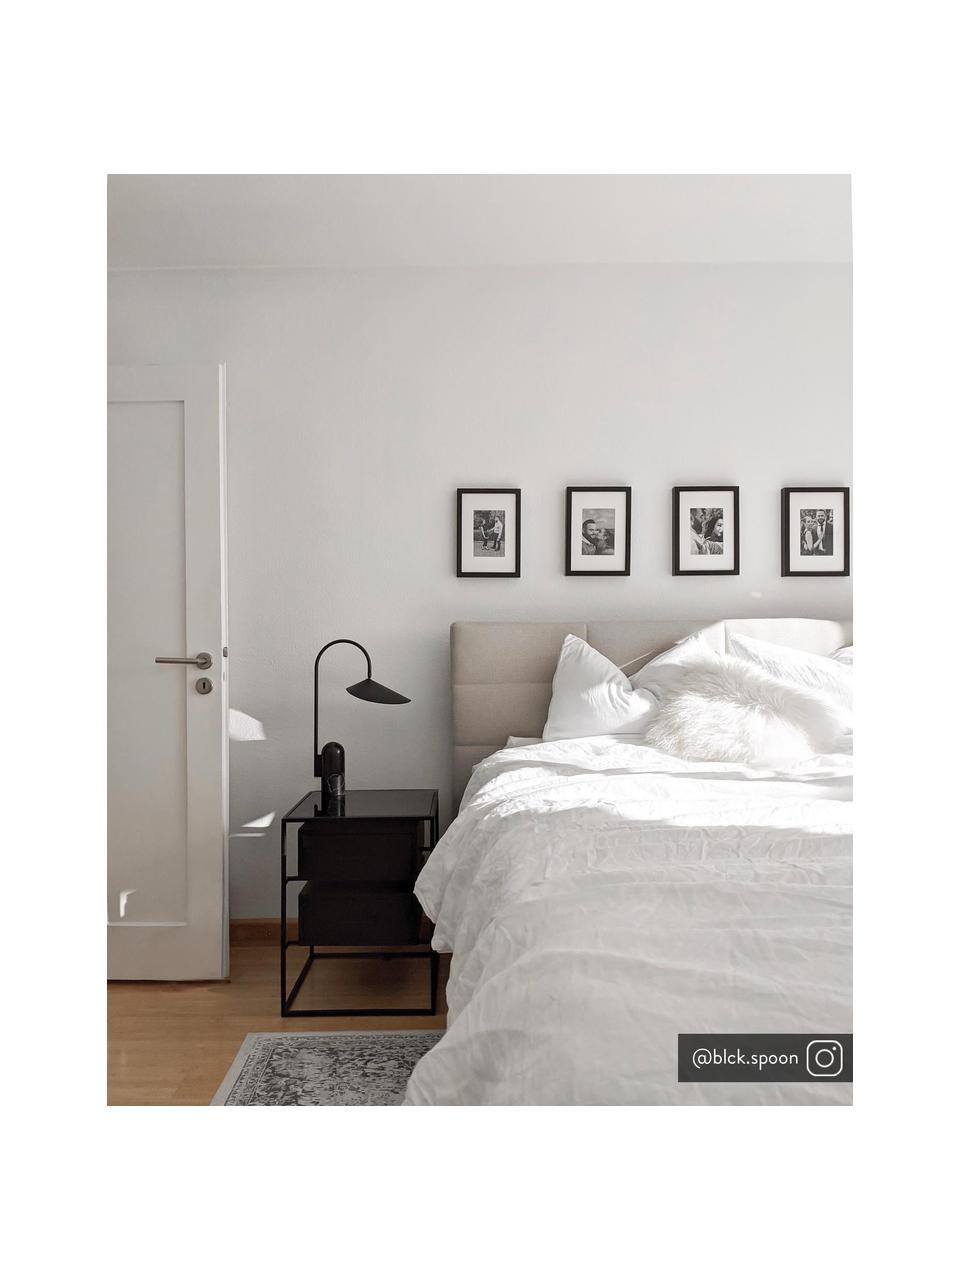 Nachtkastje Lyle met glazen blad, Plank: glas, Zwart gelakt mangohout, 45 x 58 cm